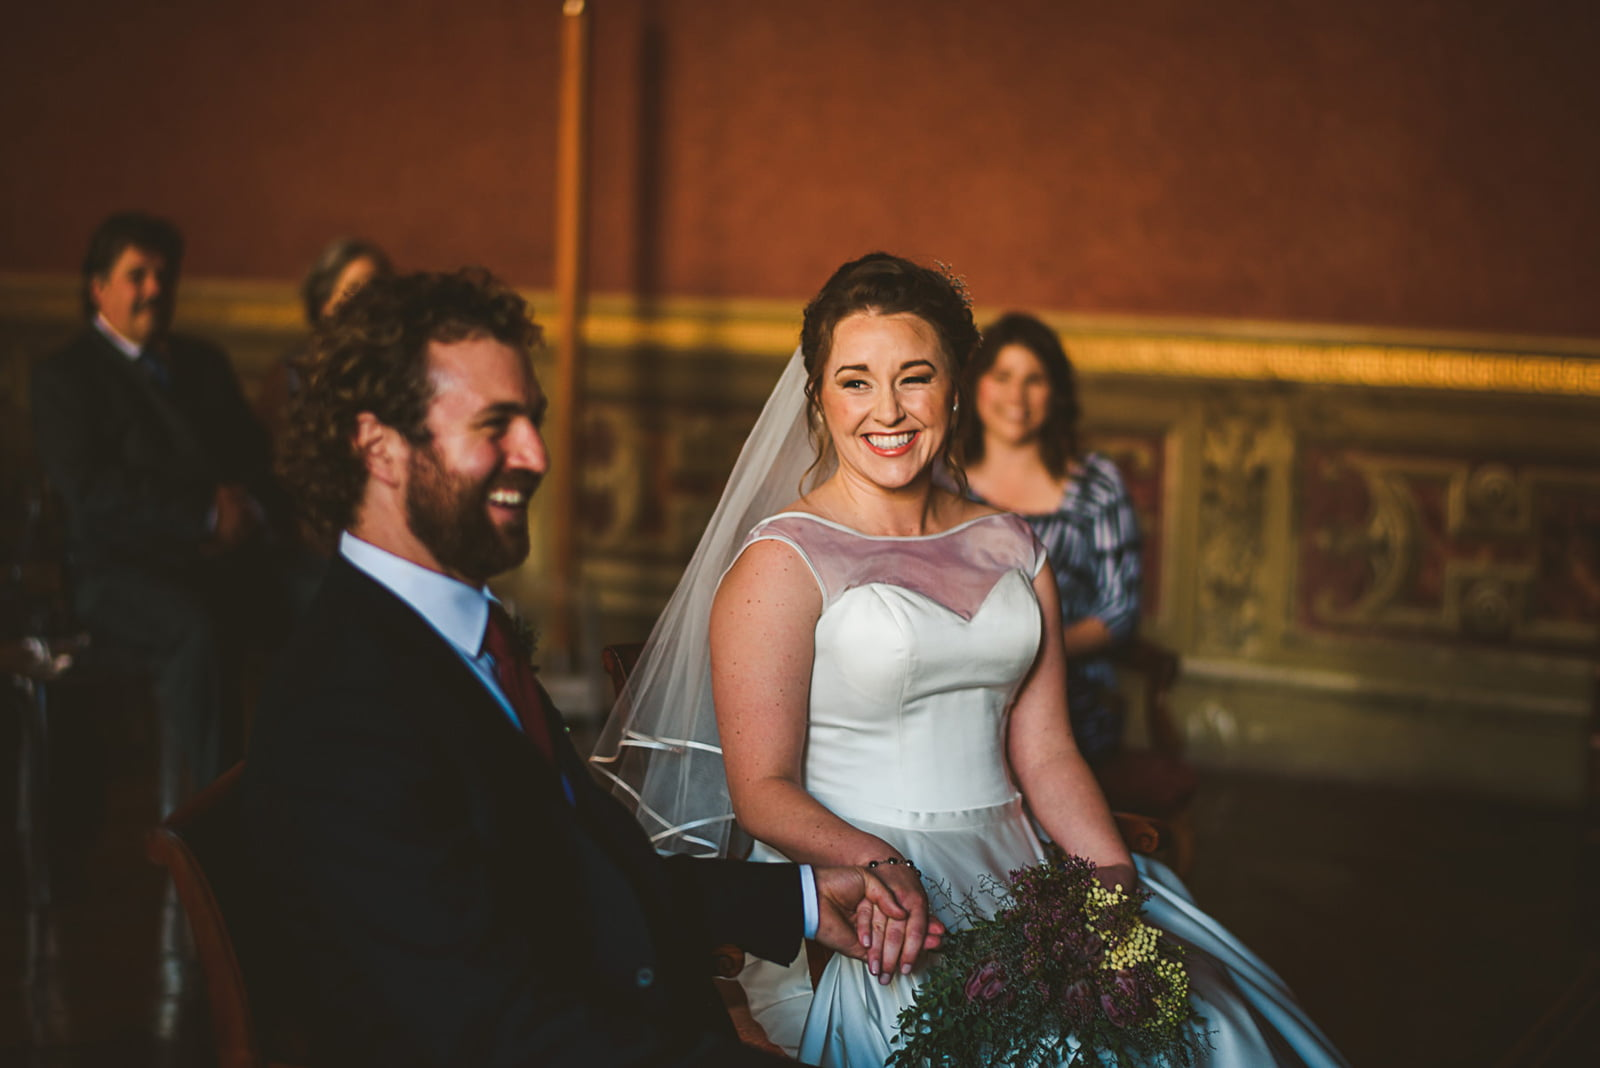 Wedding at Siena, A+L Wedding At Siena Town Hall – By Federico Pannacci Wedding Photographer, Federico Pannacci